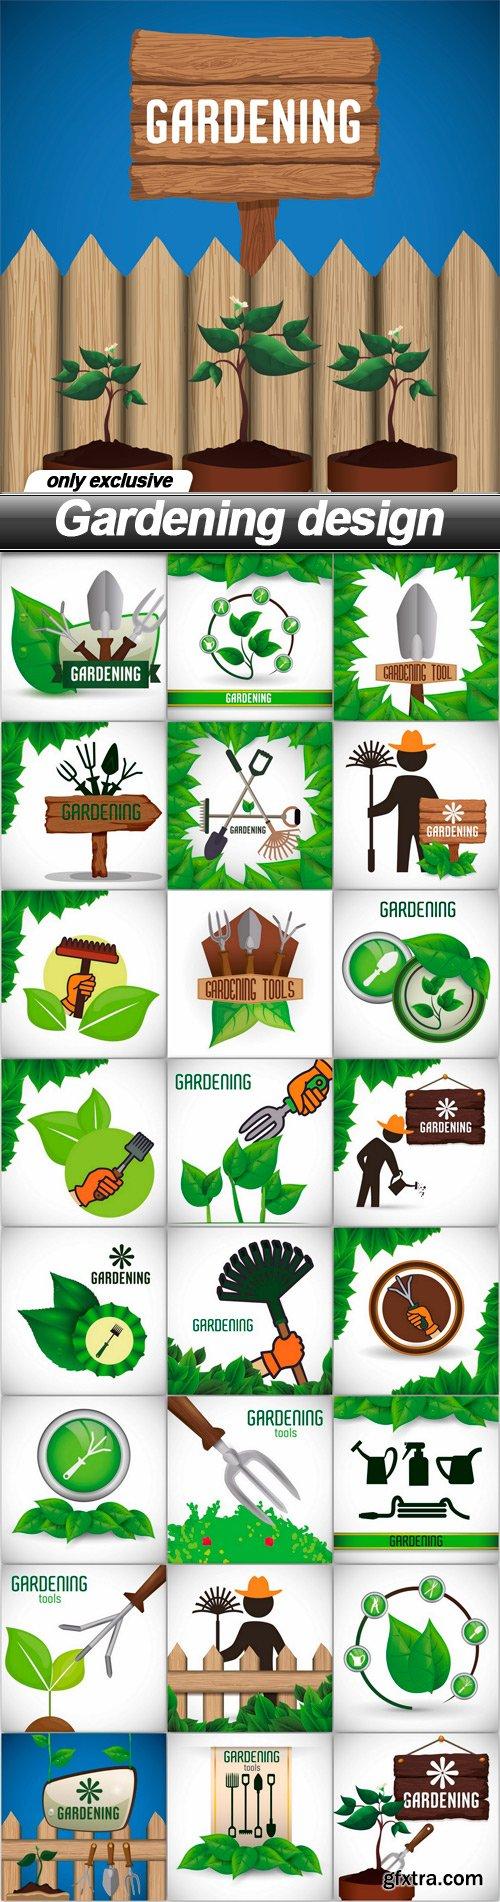 Gardening design - 25 EPS